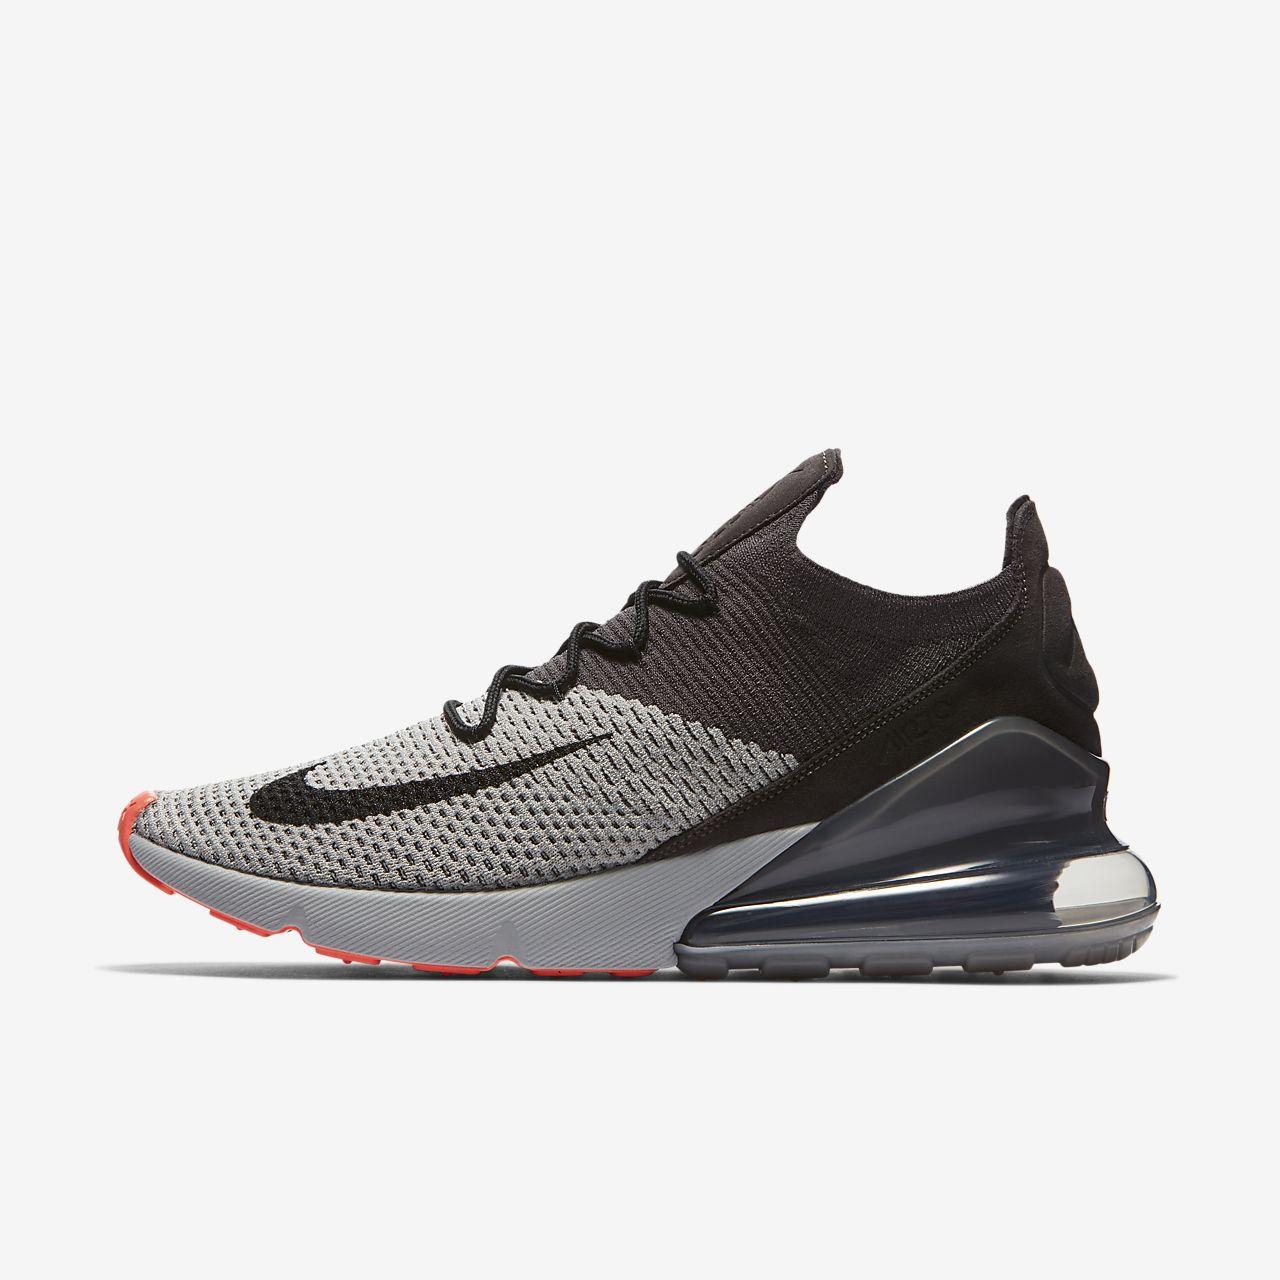 sports shoes b0f8a 34fa1 ... Nike Air Max 270 Flyknit-sko til mænd